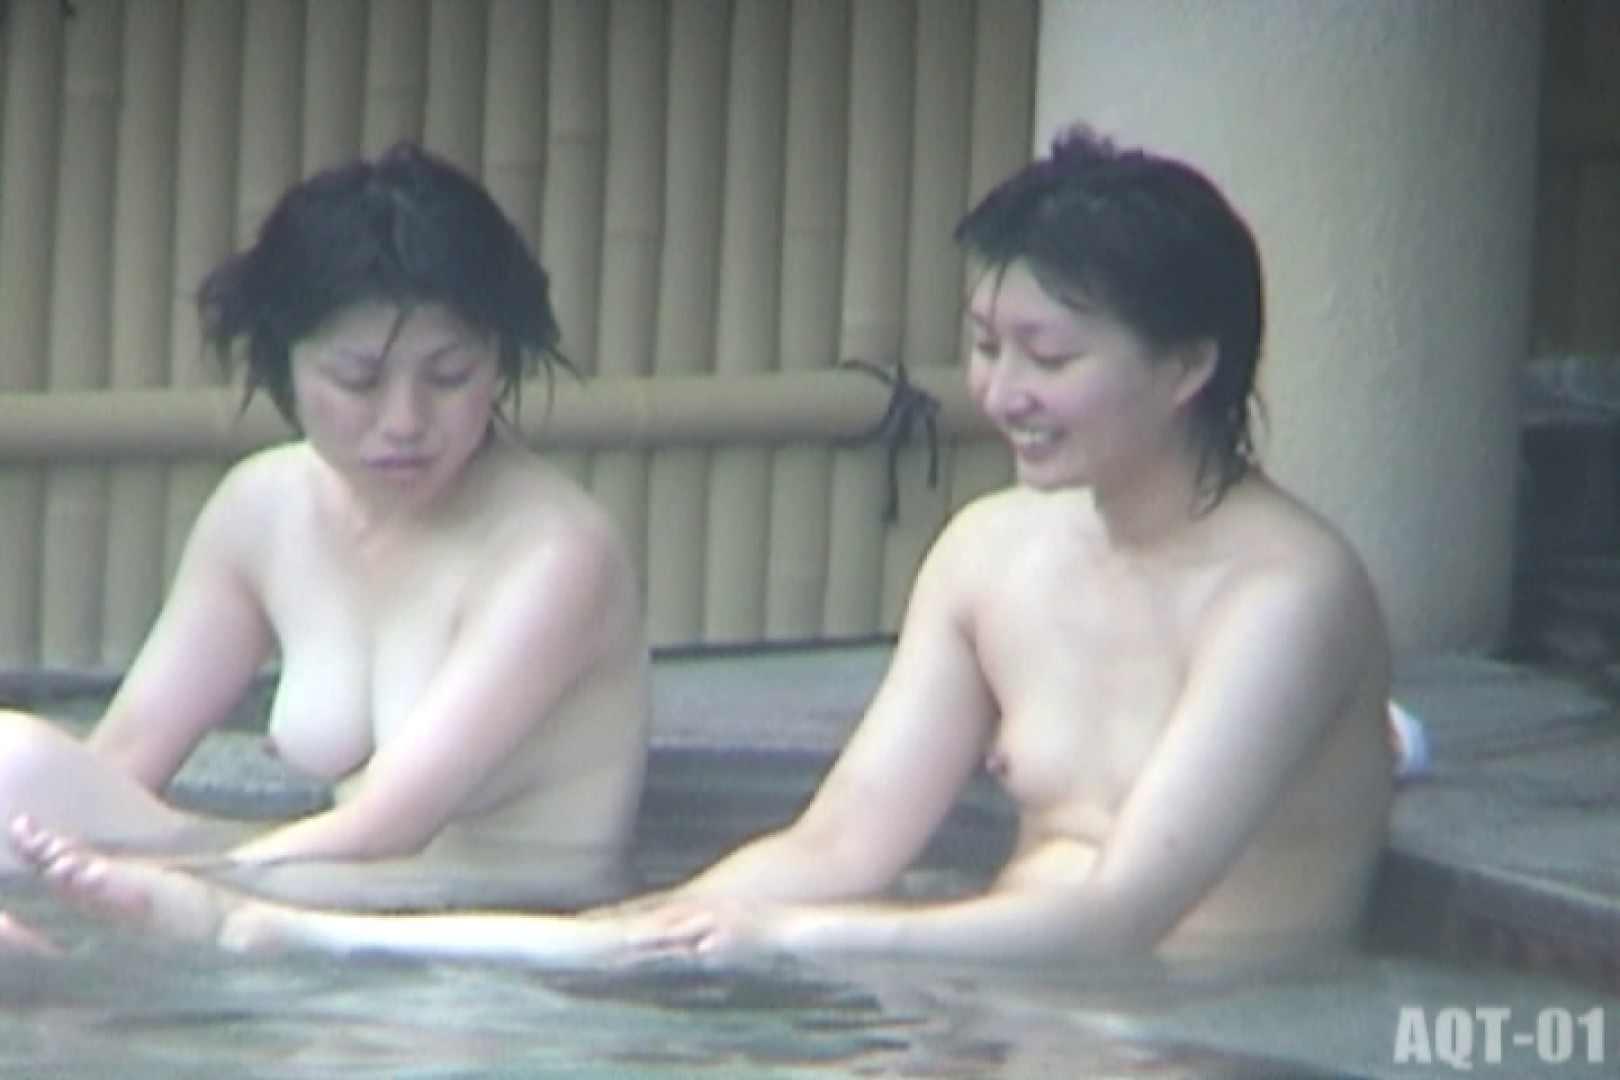 Aquaな露天風呂Vol.718 盗撮シリーズ | 露天風呂編  109PIX 1